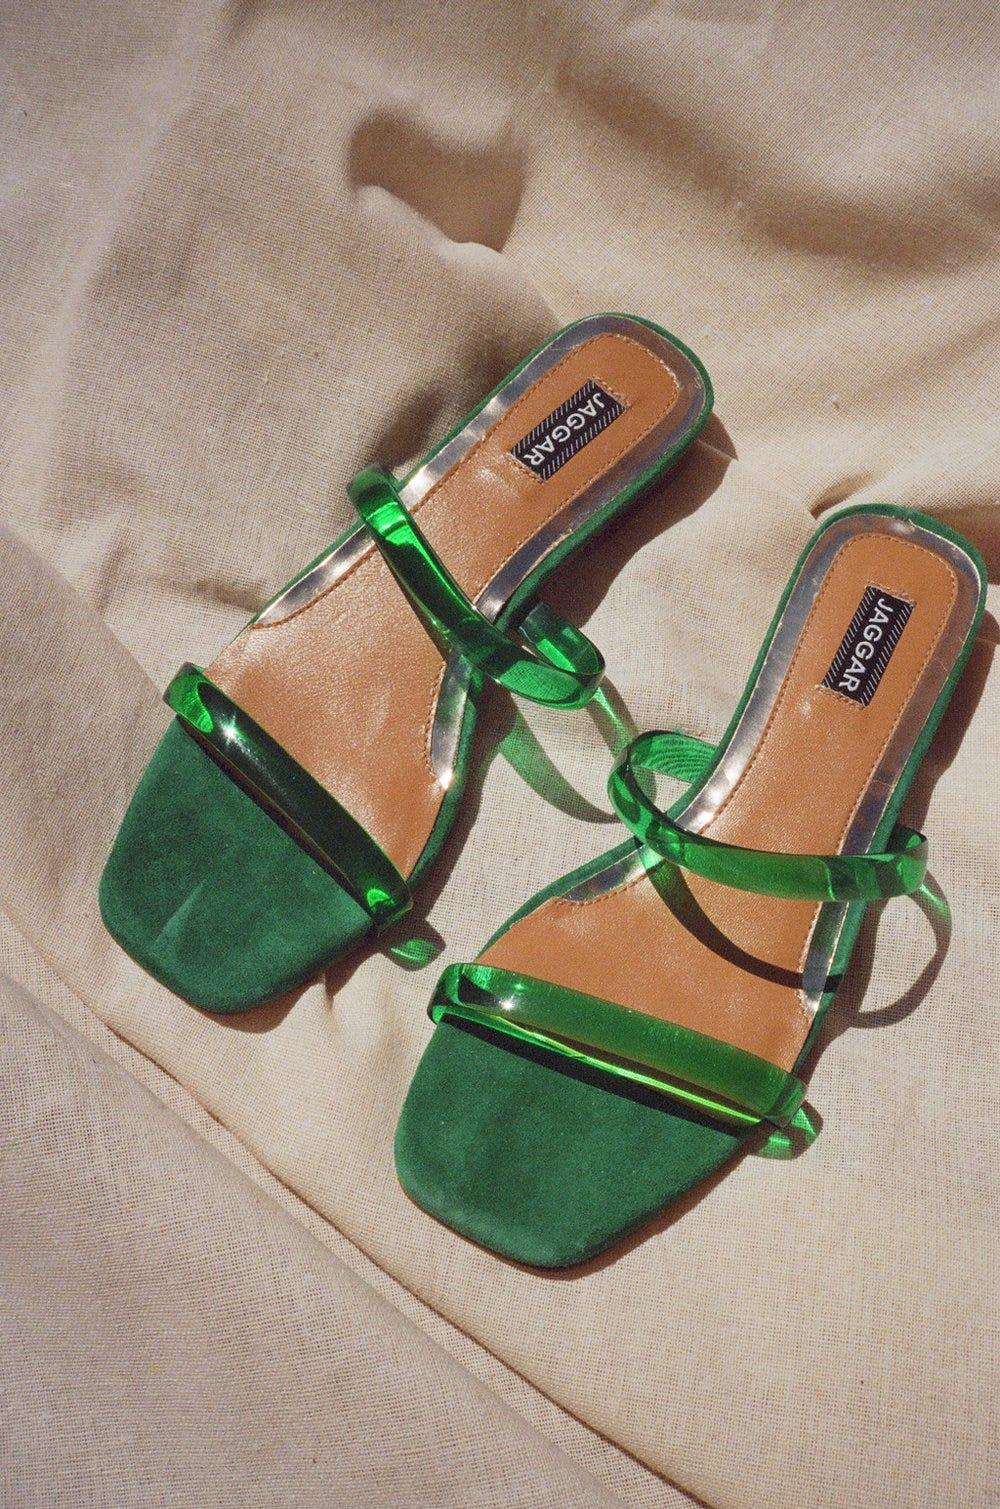 b145707902b Clear See-Through PVC Sandals, Heels Trend Summer 2018